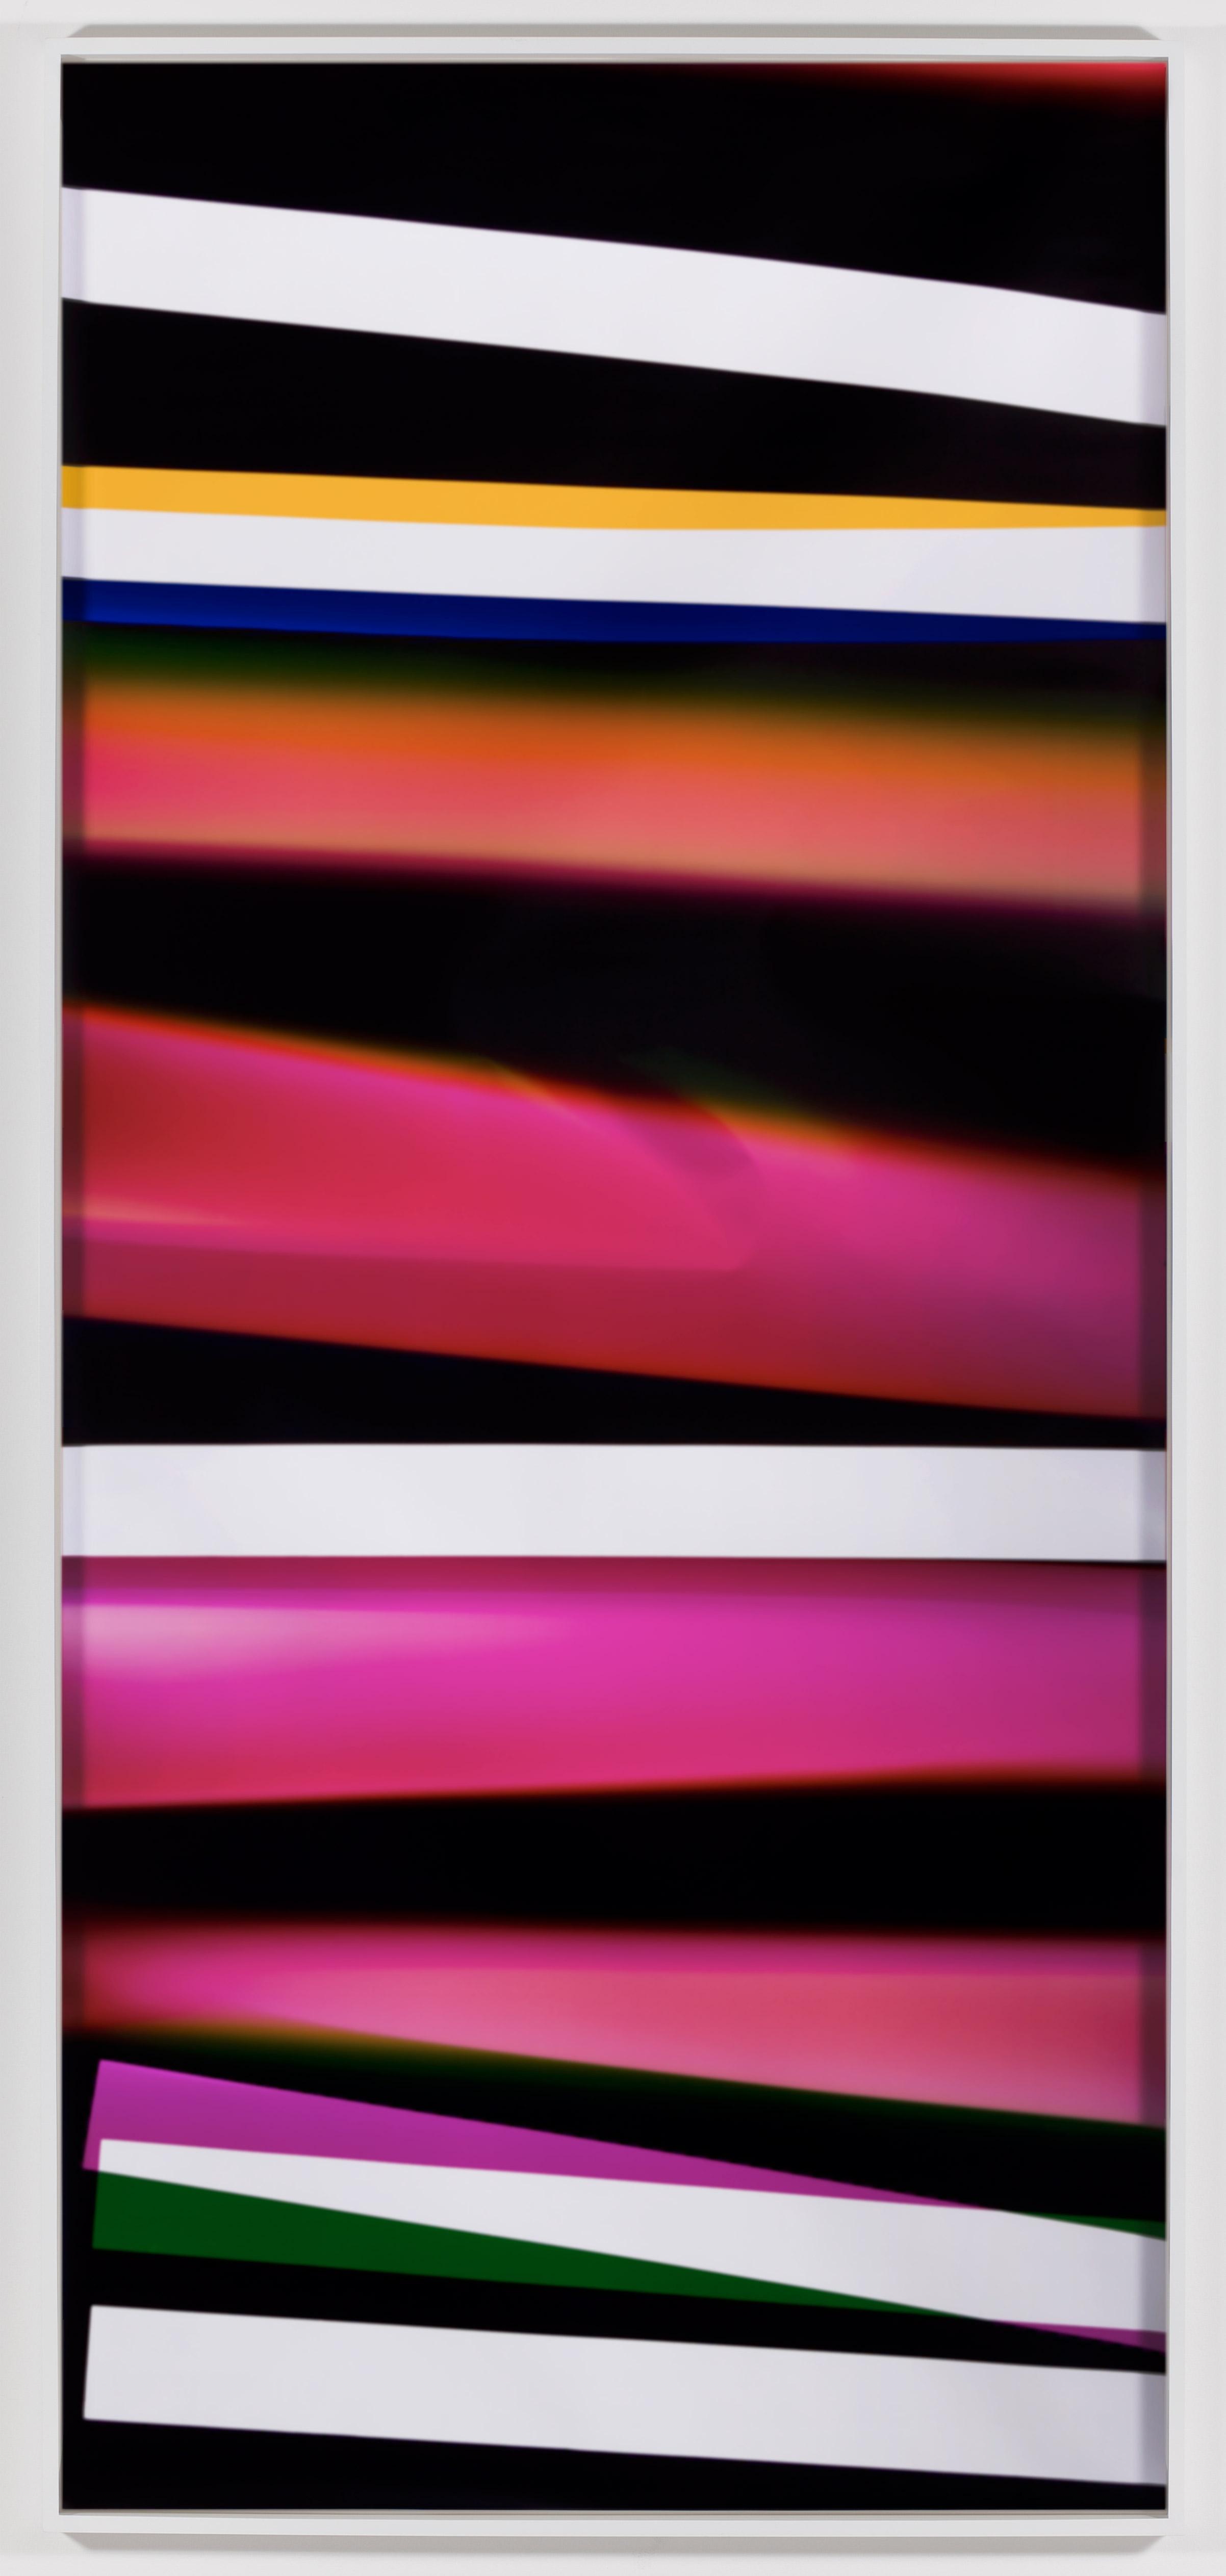 Black Curl (CMY/Five Magnet: Irvine, California, March 26,2010, Fujicolor Crystal Archive Super Type C, Em. No. 165-021, 06910)    2011   Color photographic paper  111 x 50 inches   PROCESSCOLORFIELD, 2011